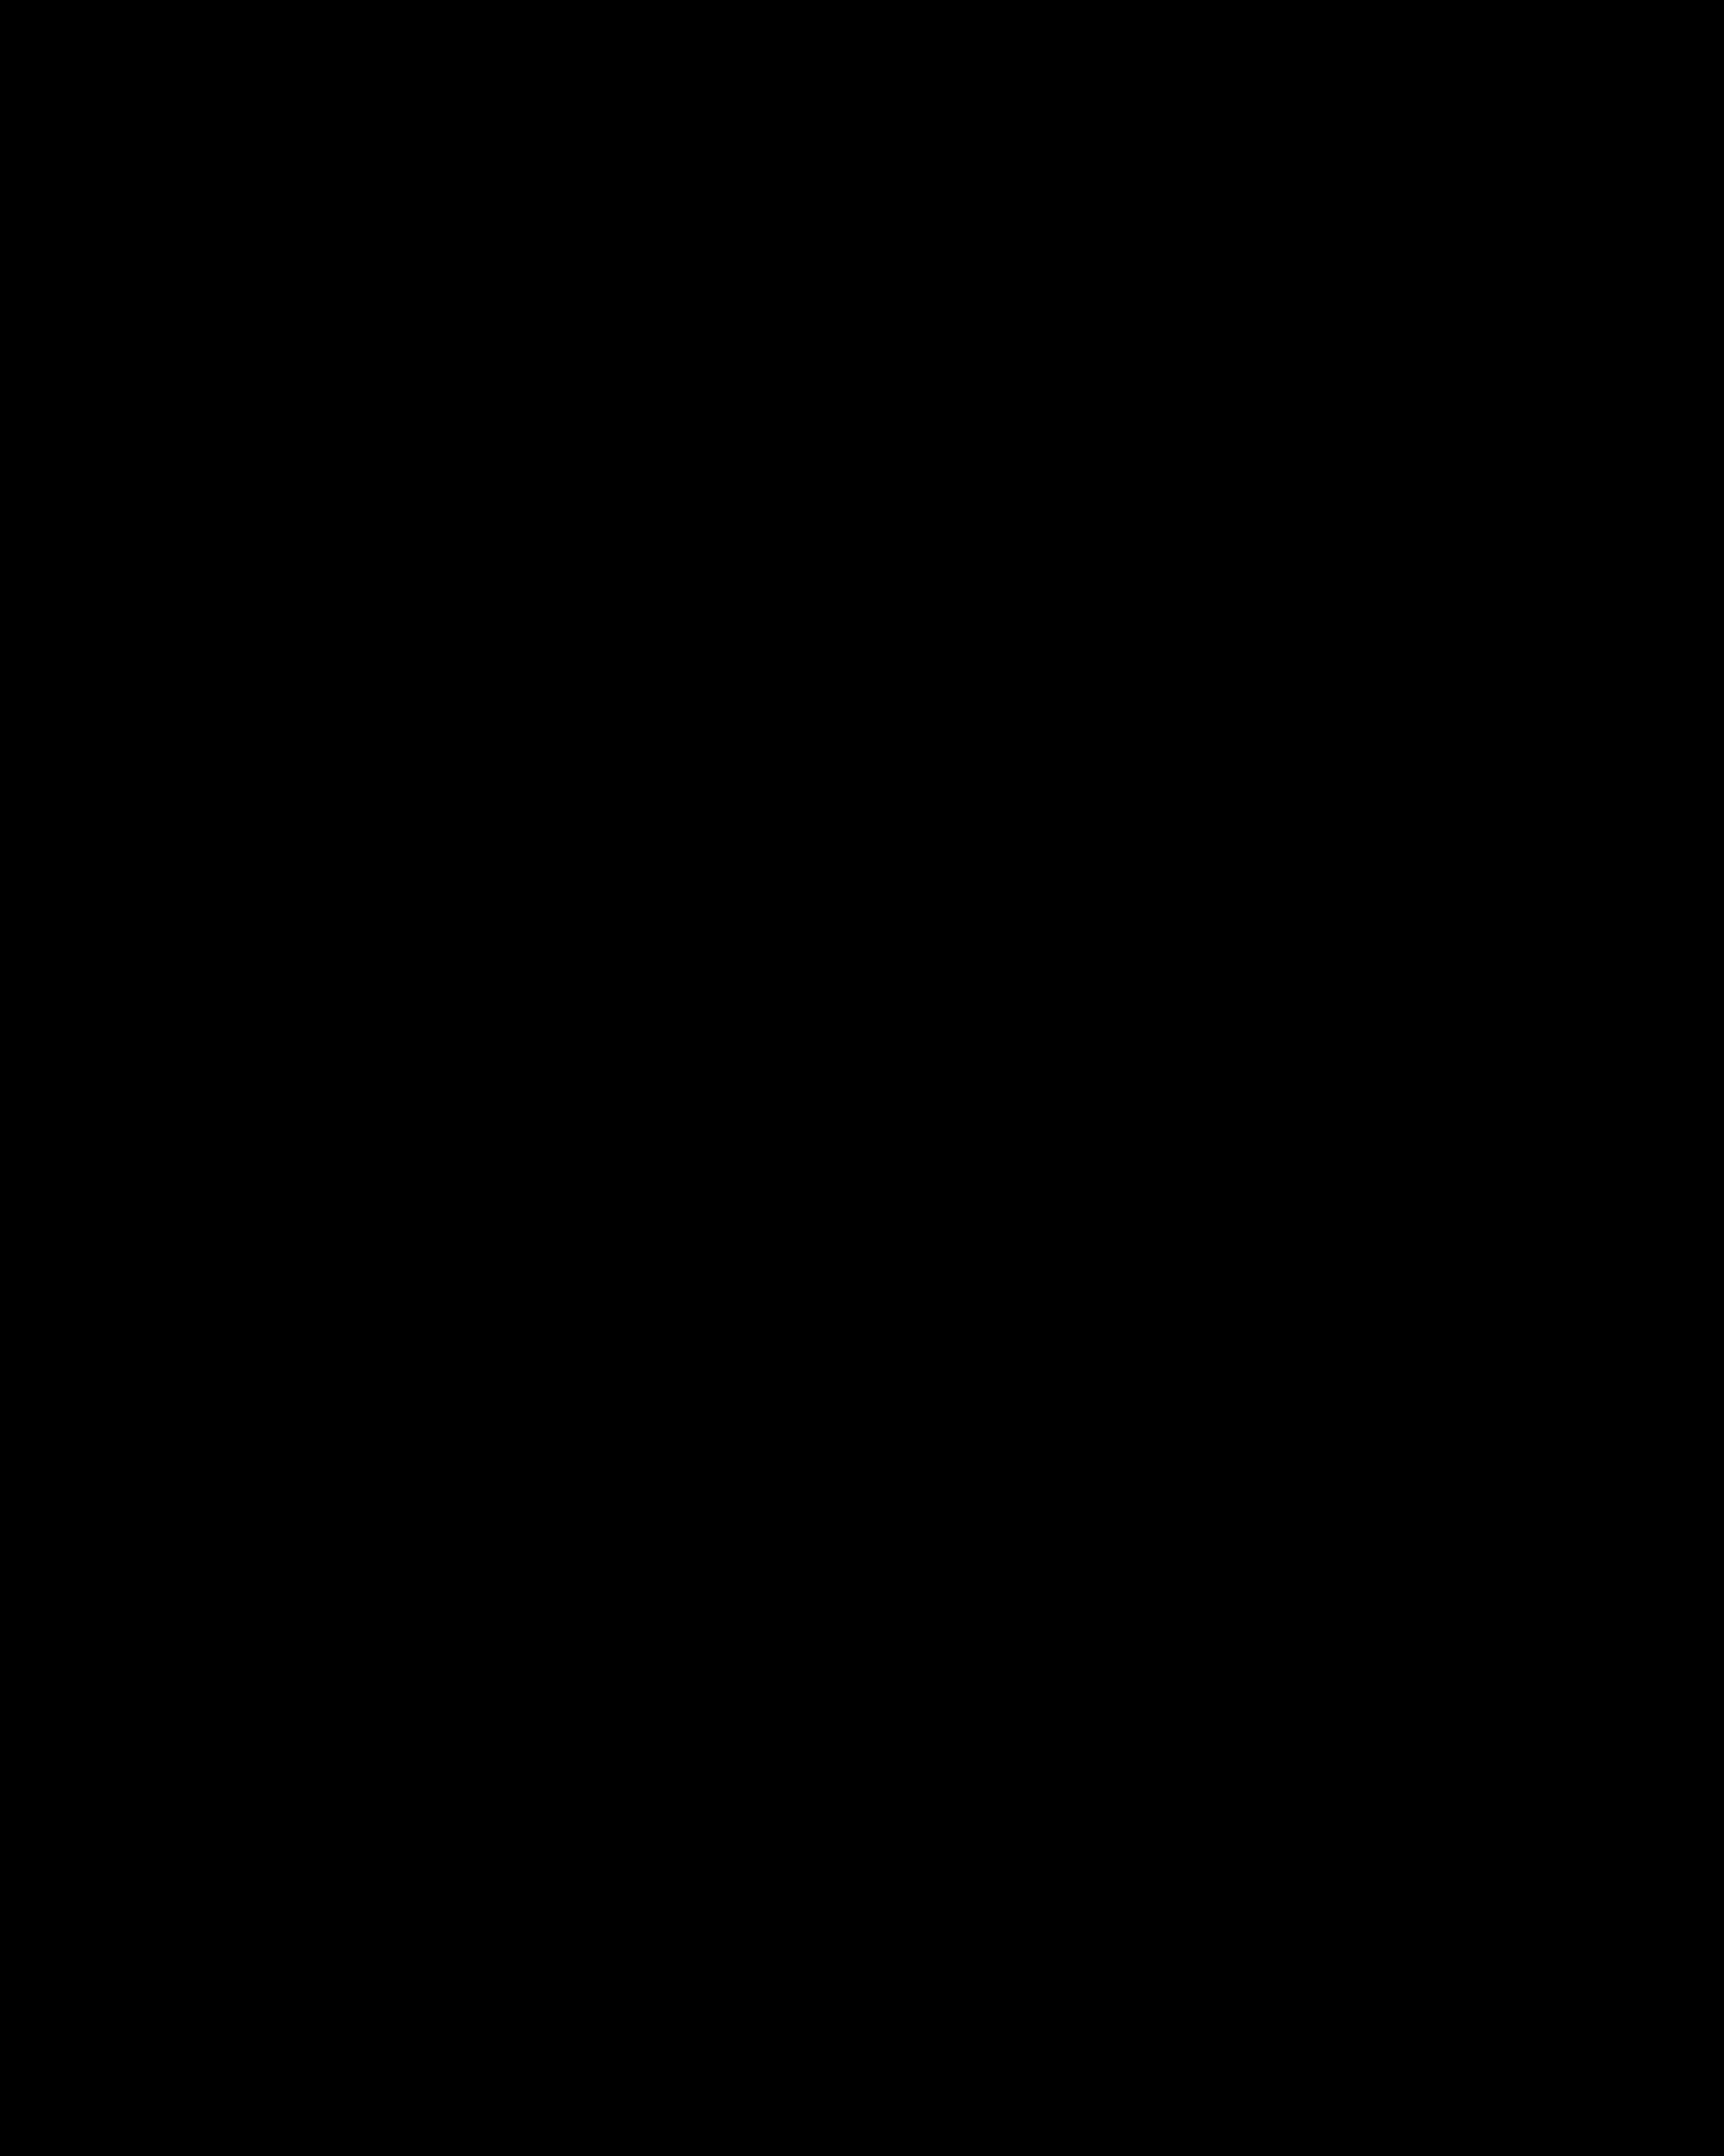 Dragon clipart hydra. Drawing at getdrawings com